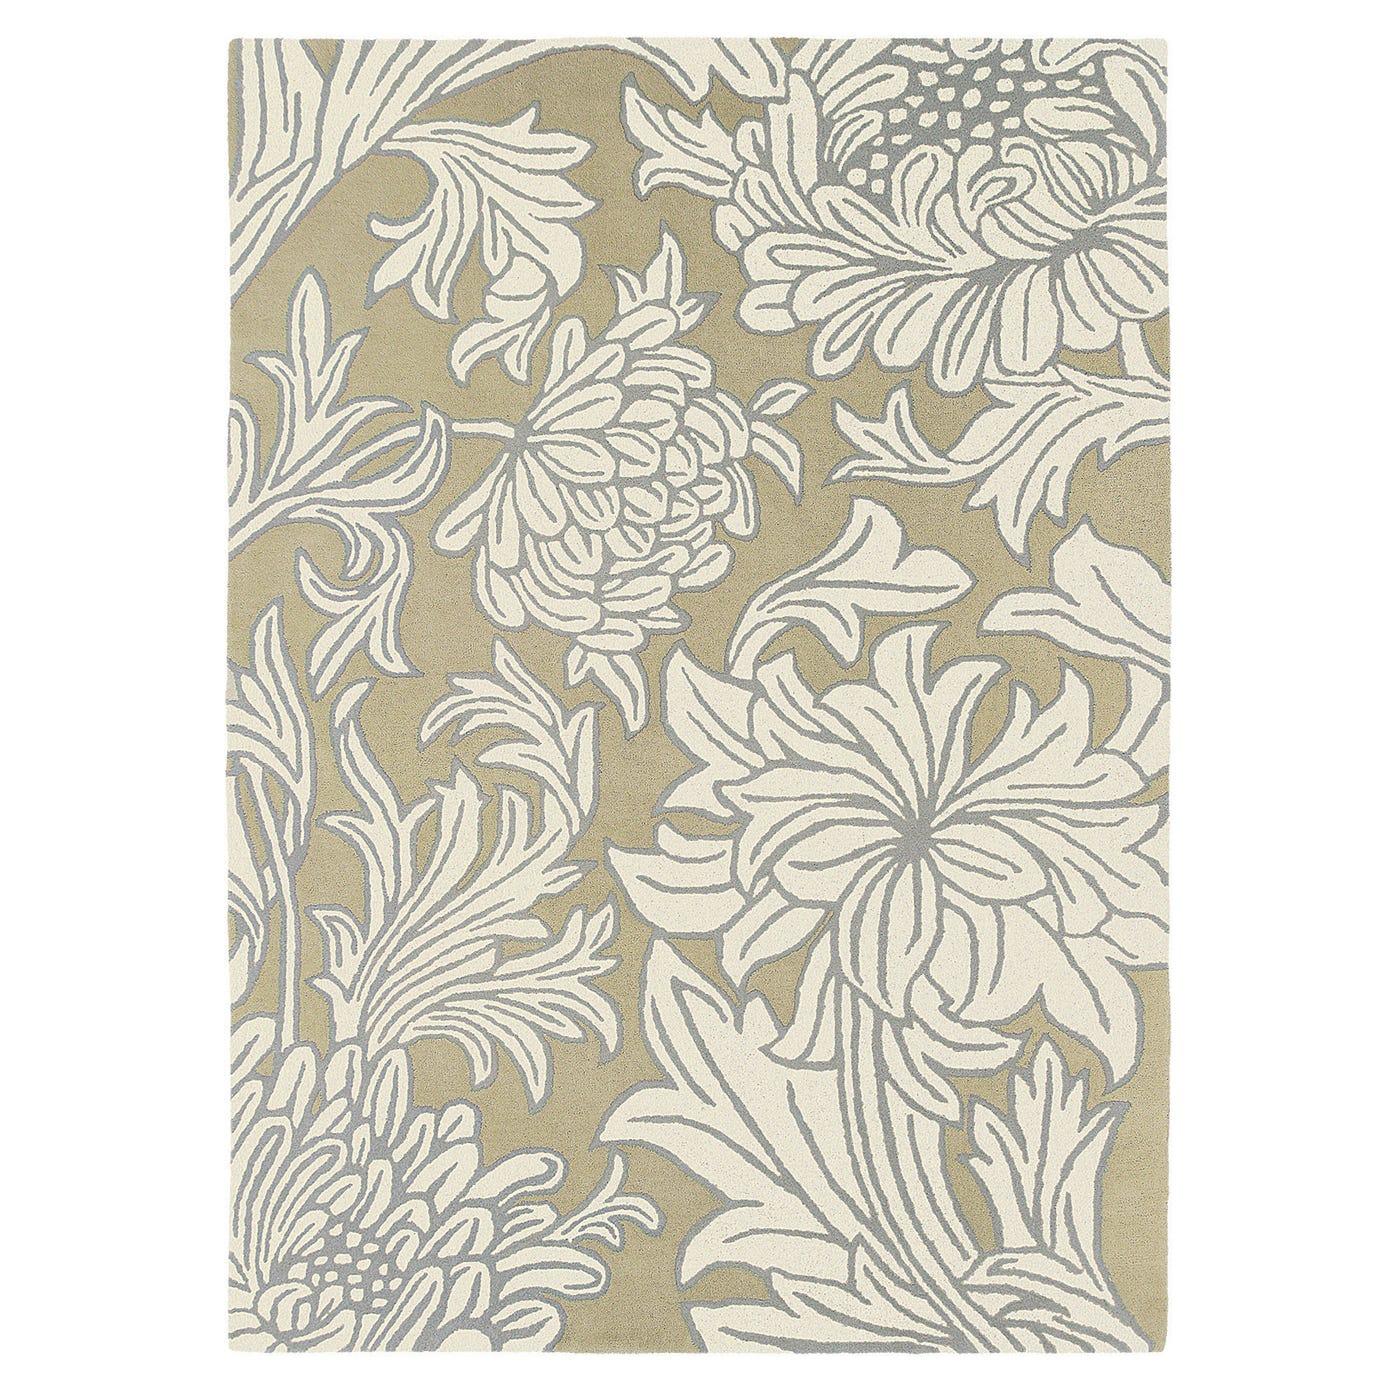 Chrysanthemum Rug 170 x 240cm Sisal